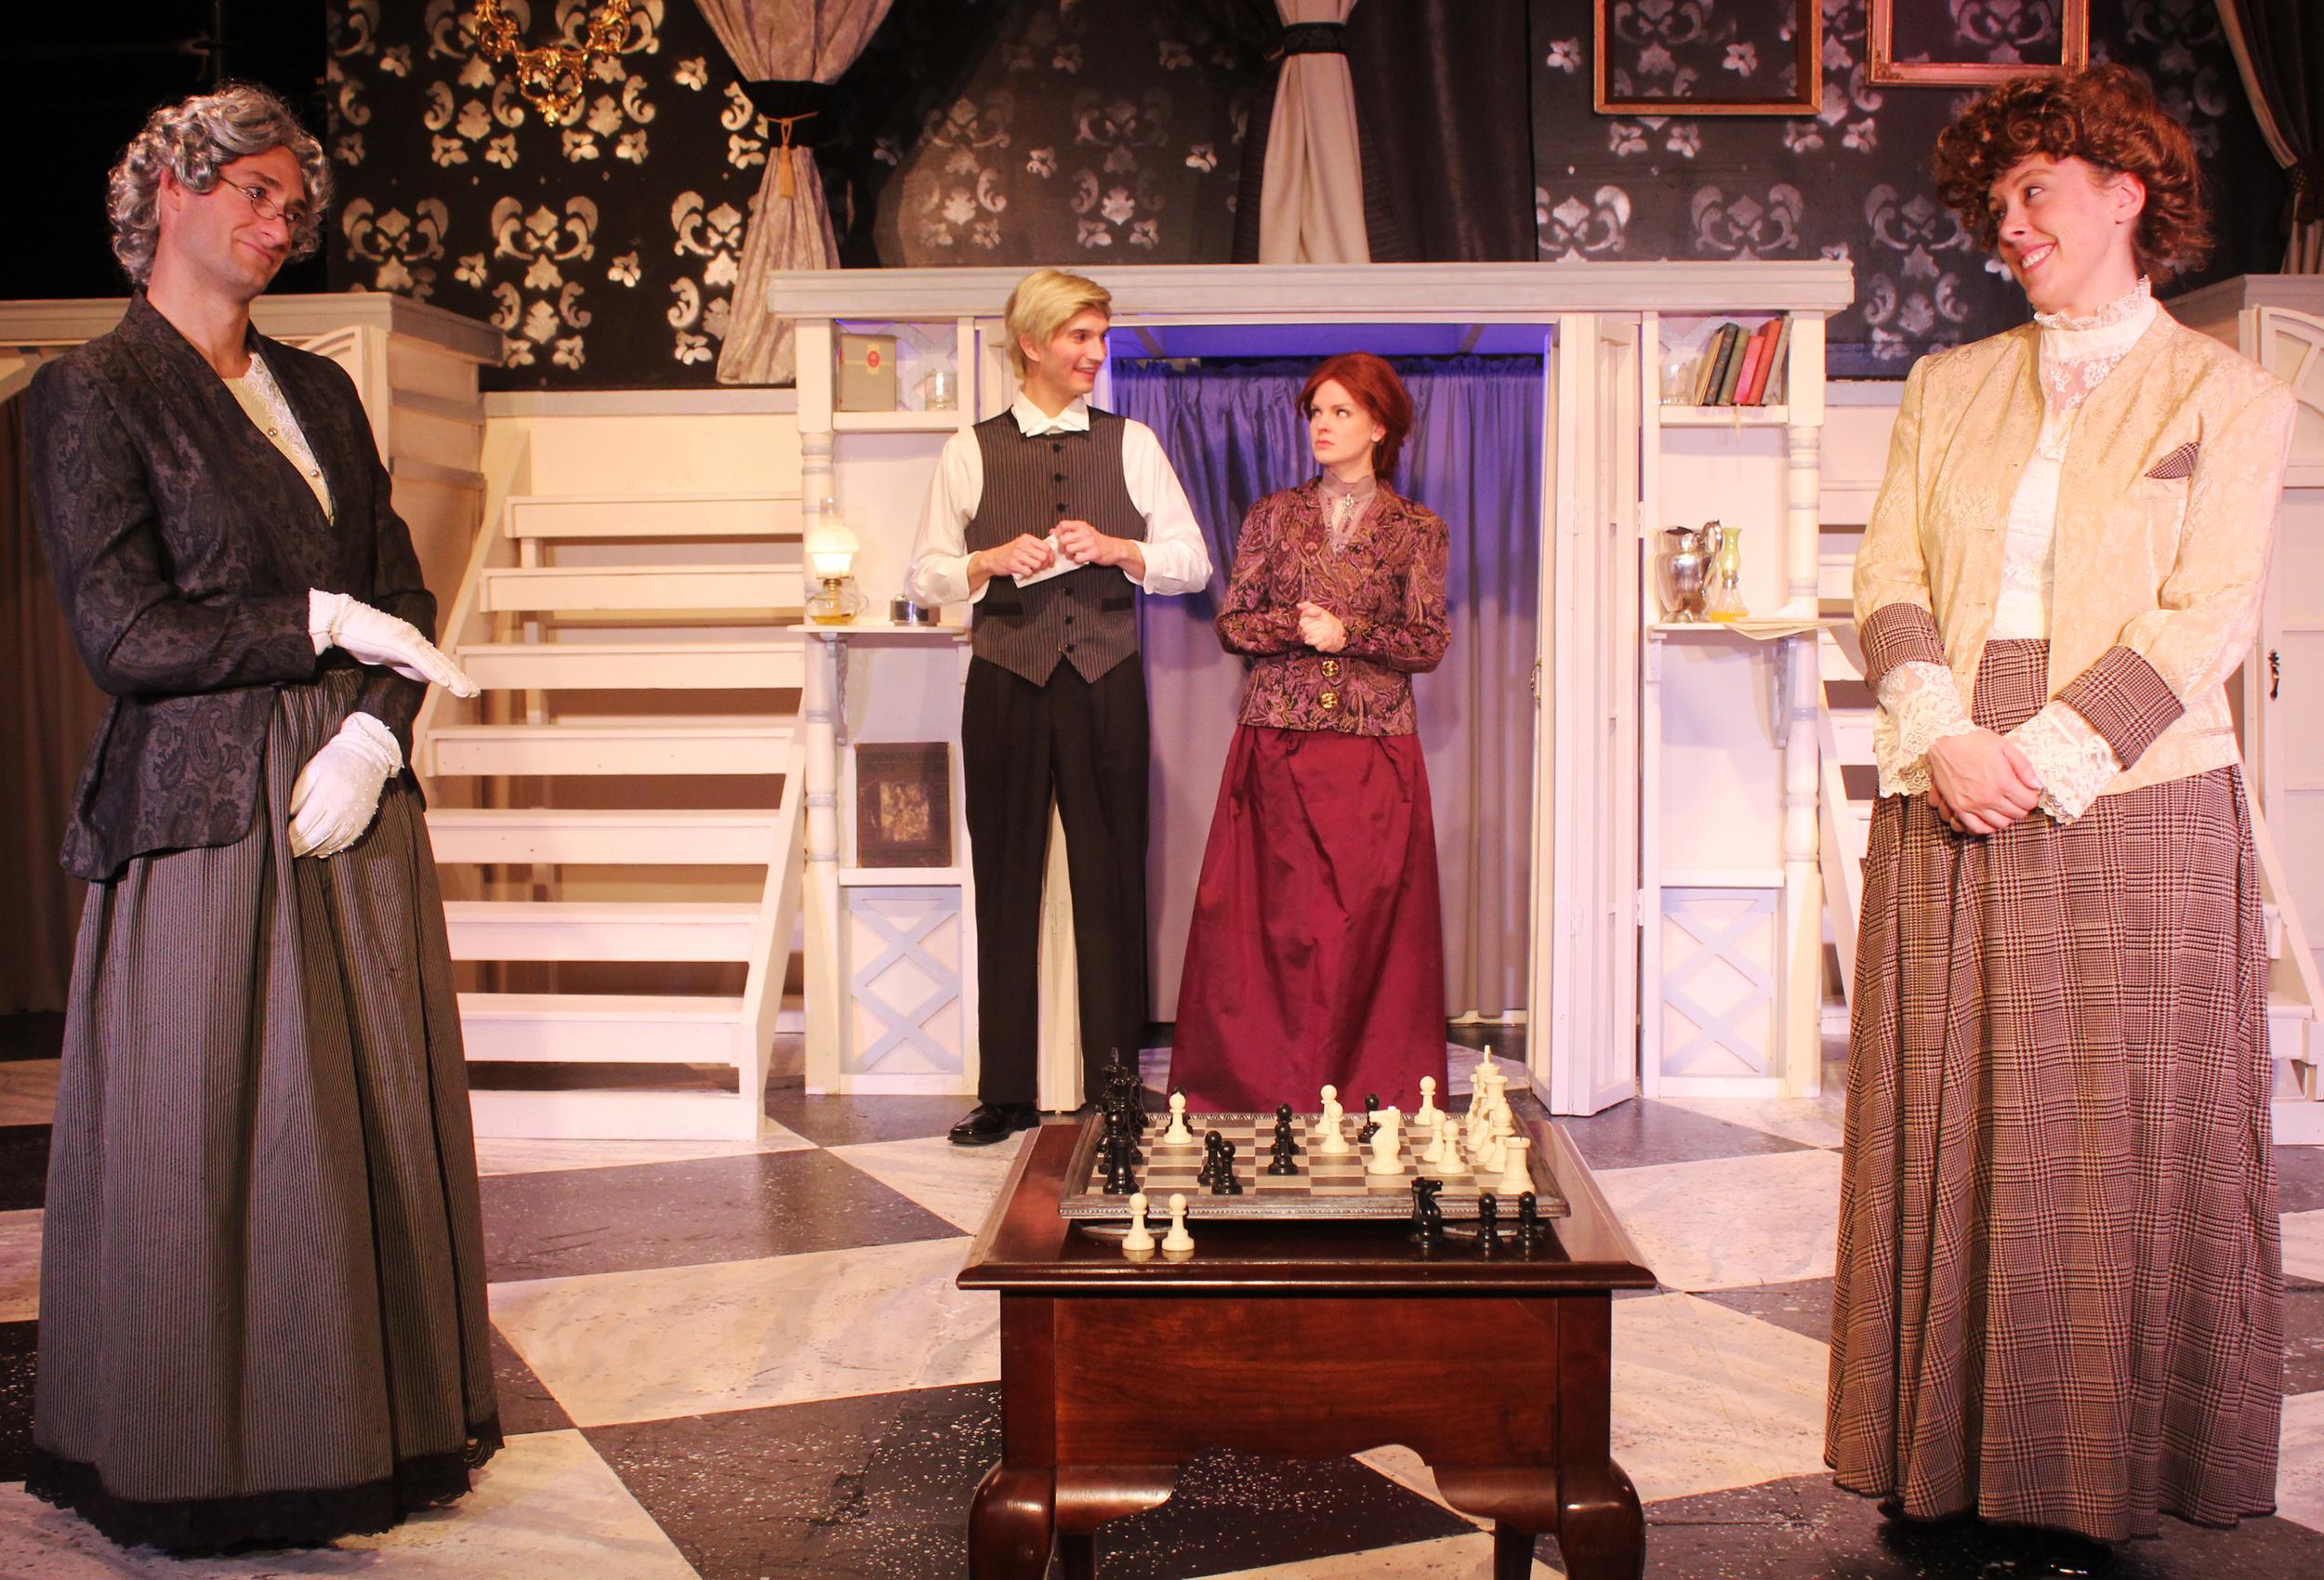 Lady Markby (Ian Potter), Mason (Thomas Weaver), Mrs. Cheveley (Kathryn Miller), Lady Gertrude Chiltern (Tara Herweg-Mann)